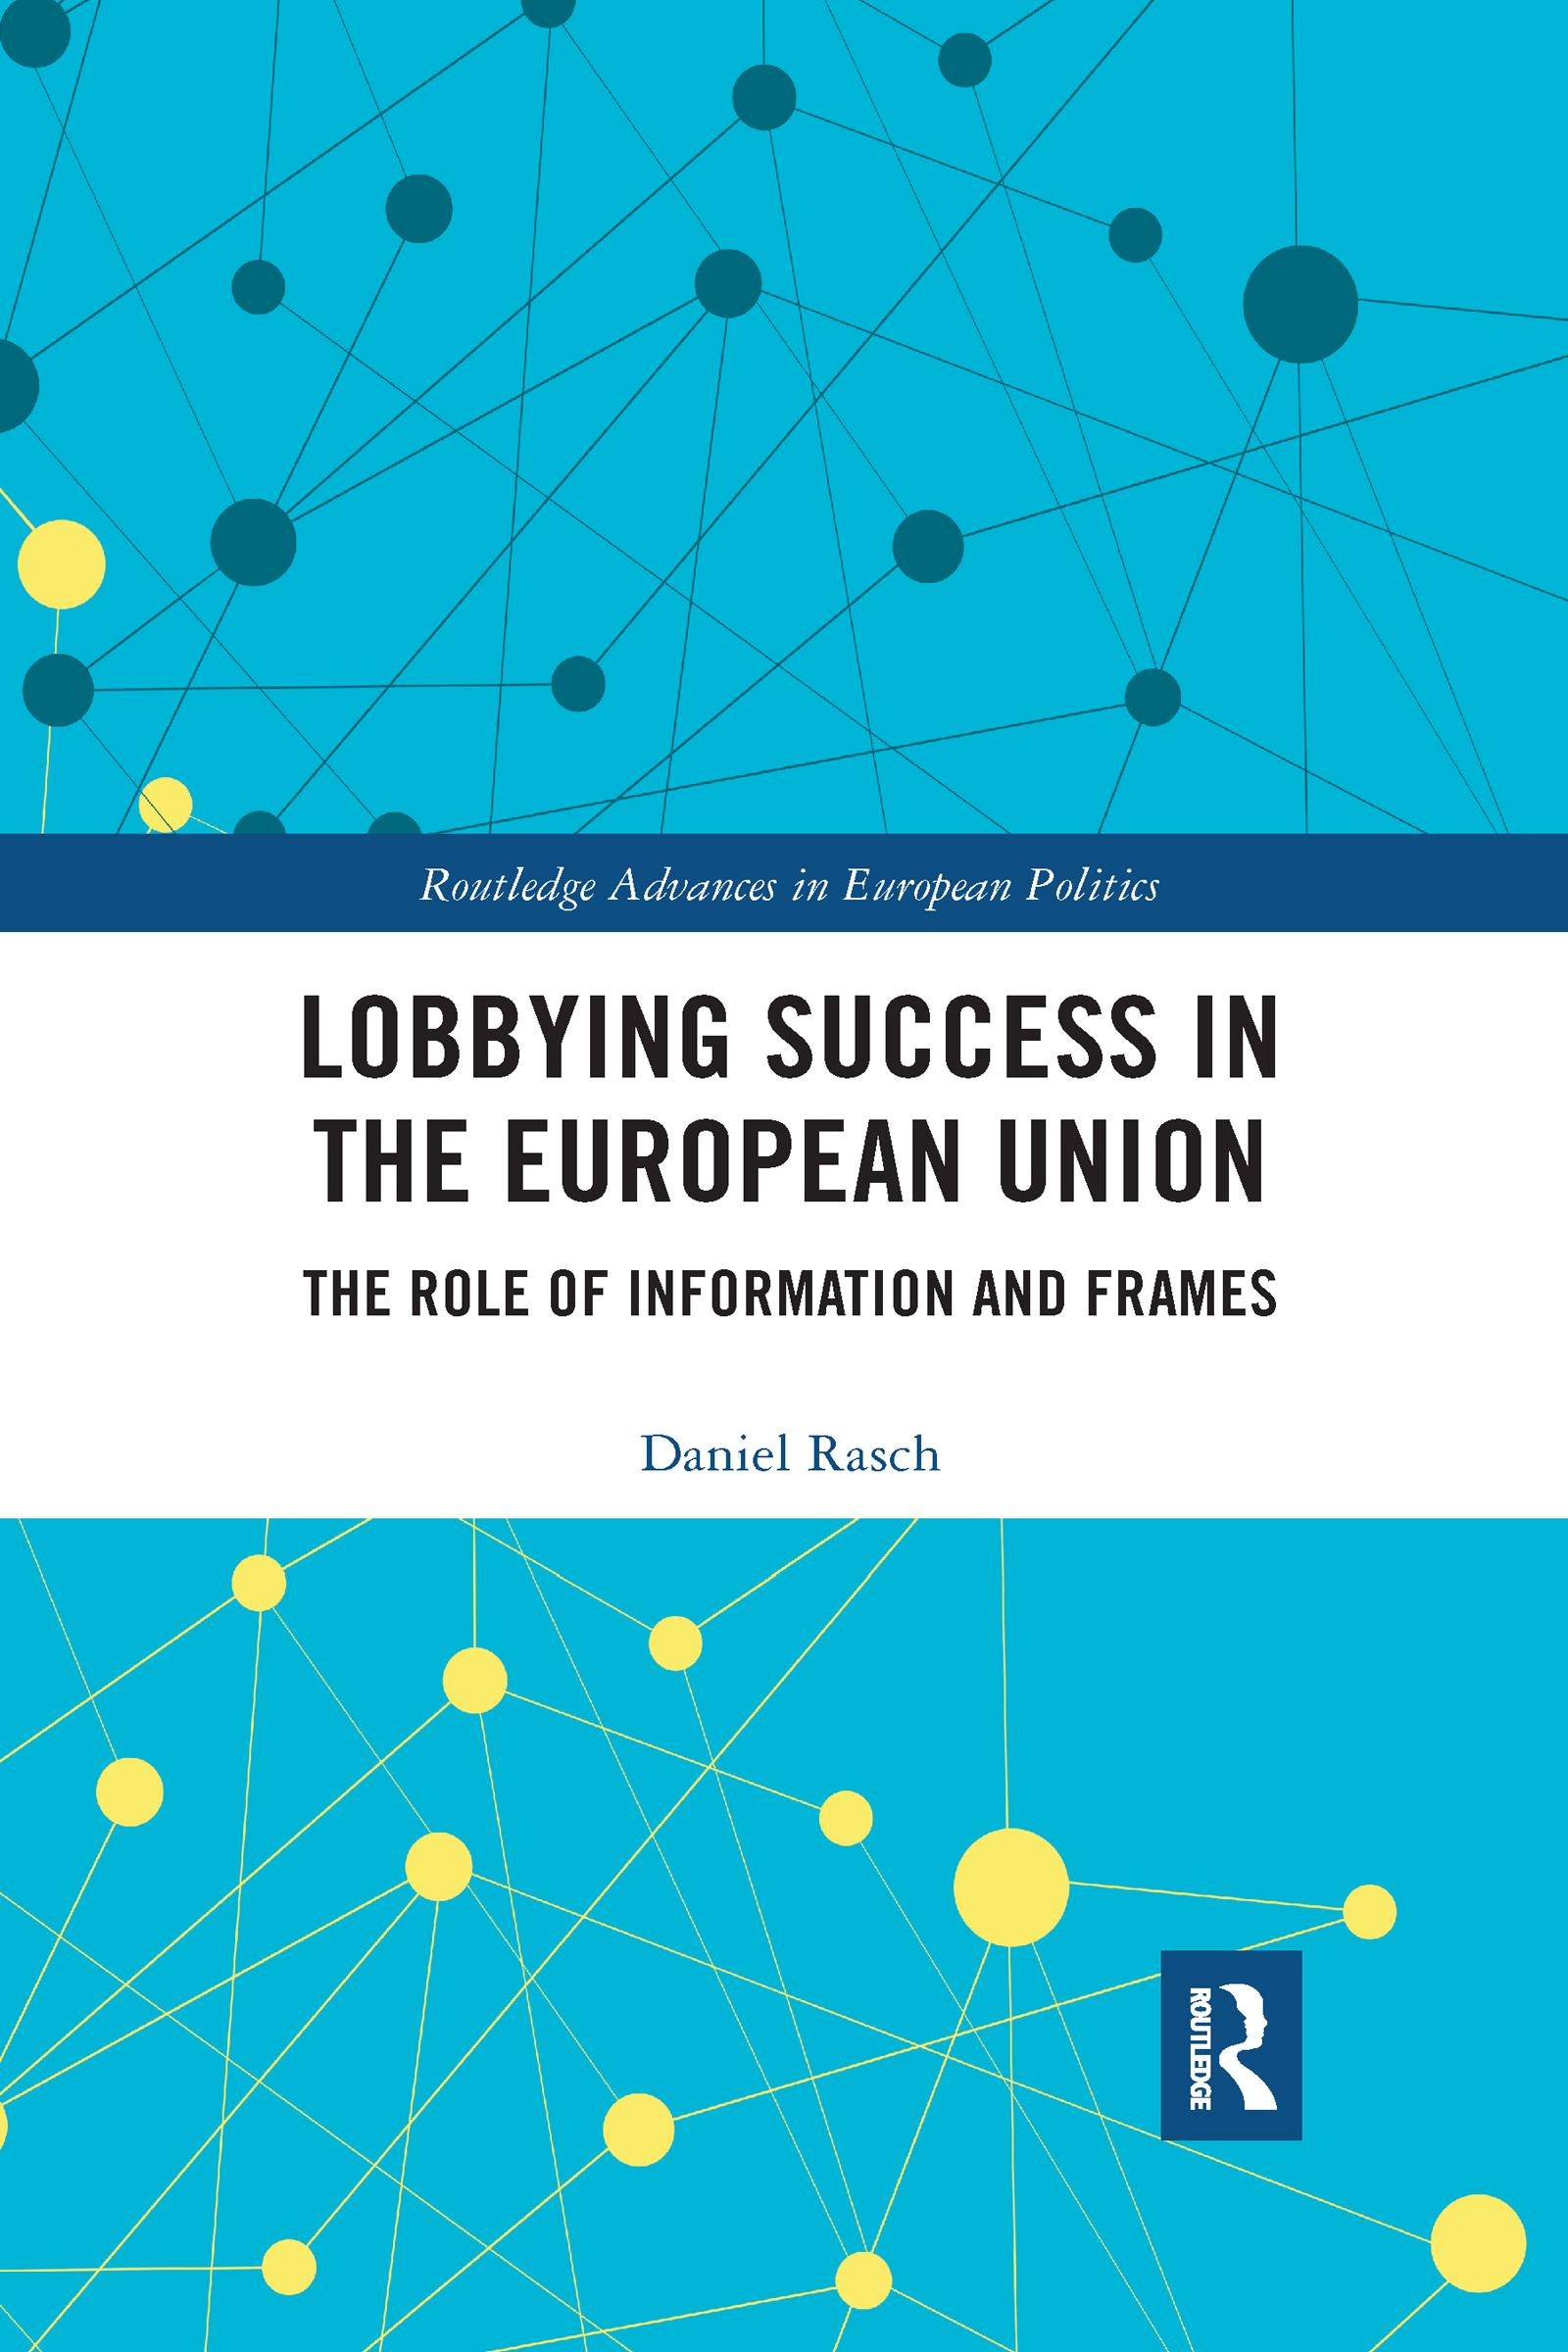 Lobbying Success in the European Union